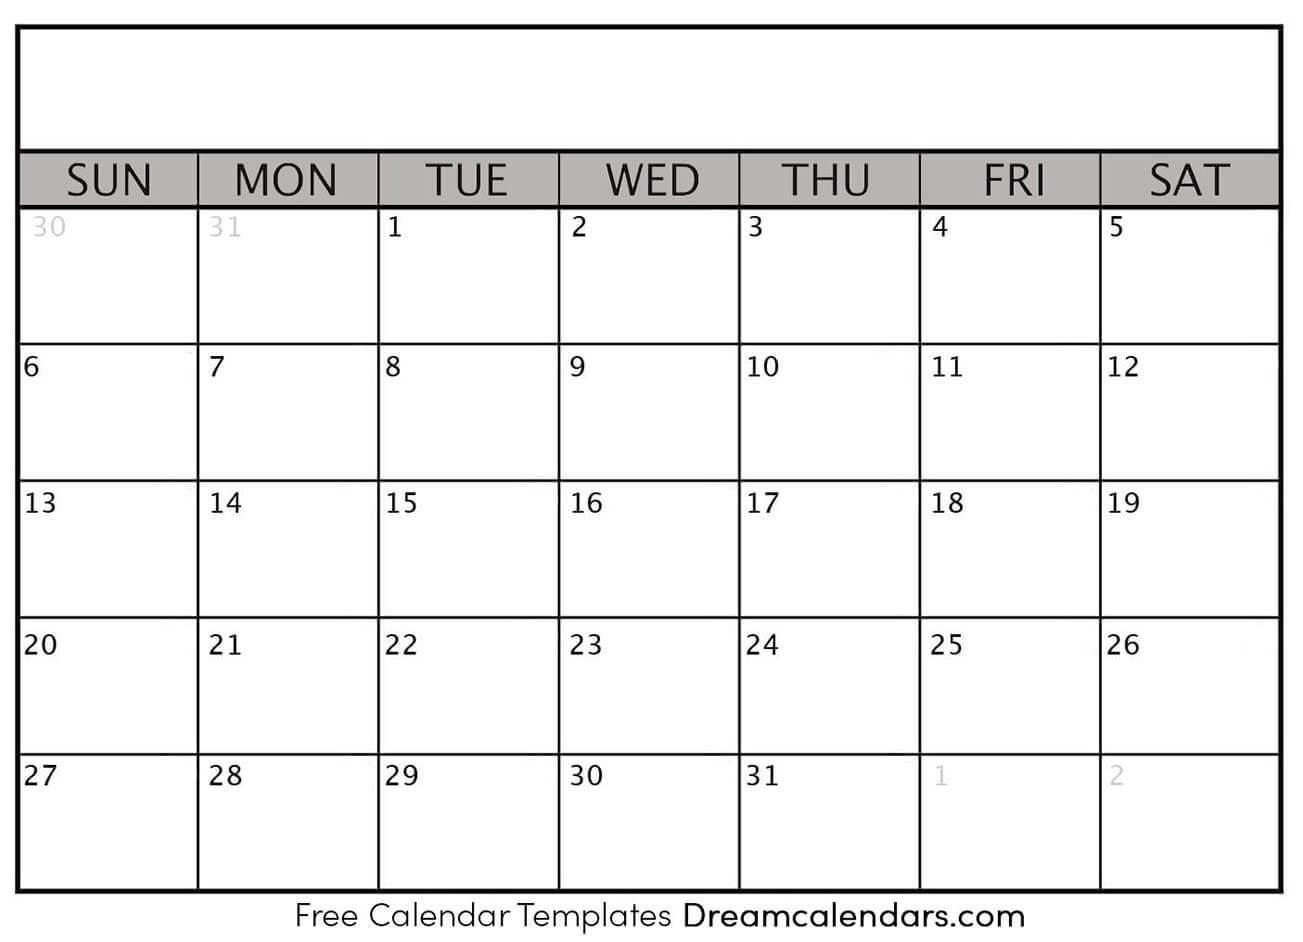 Printable Blank Calendar - Dream Calendars regarding Blank Calendar Of Events Template